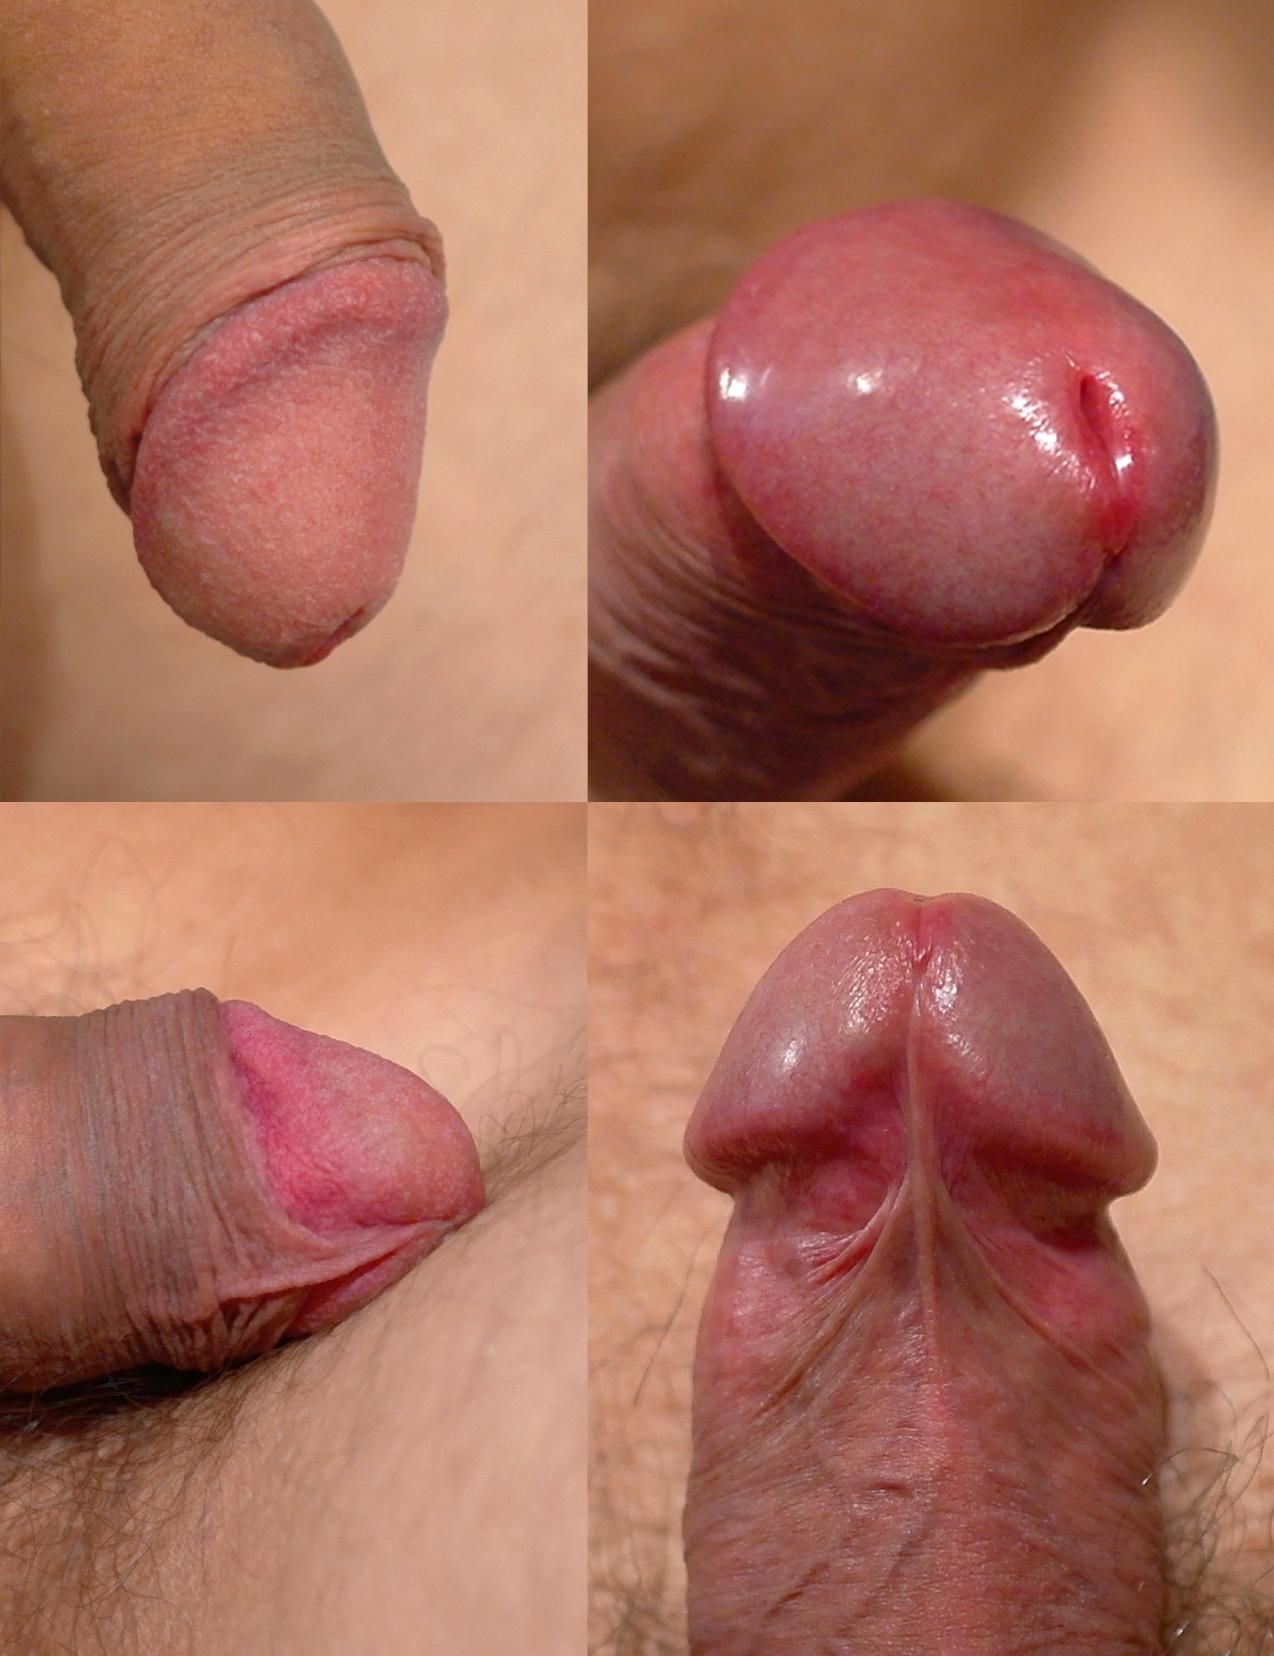 Simosis of the penis